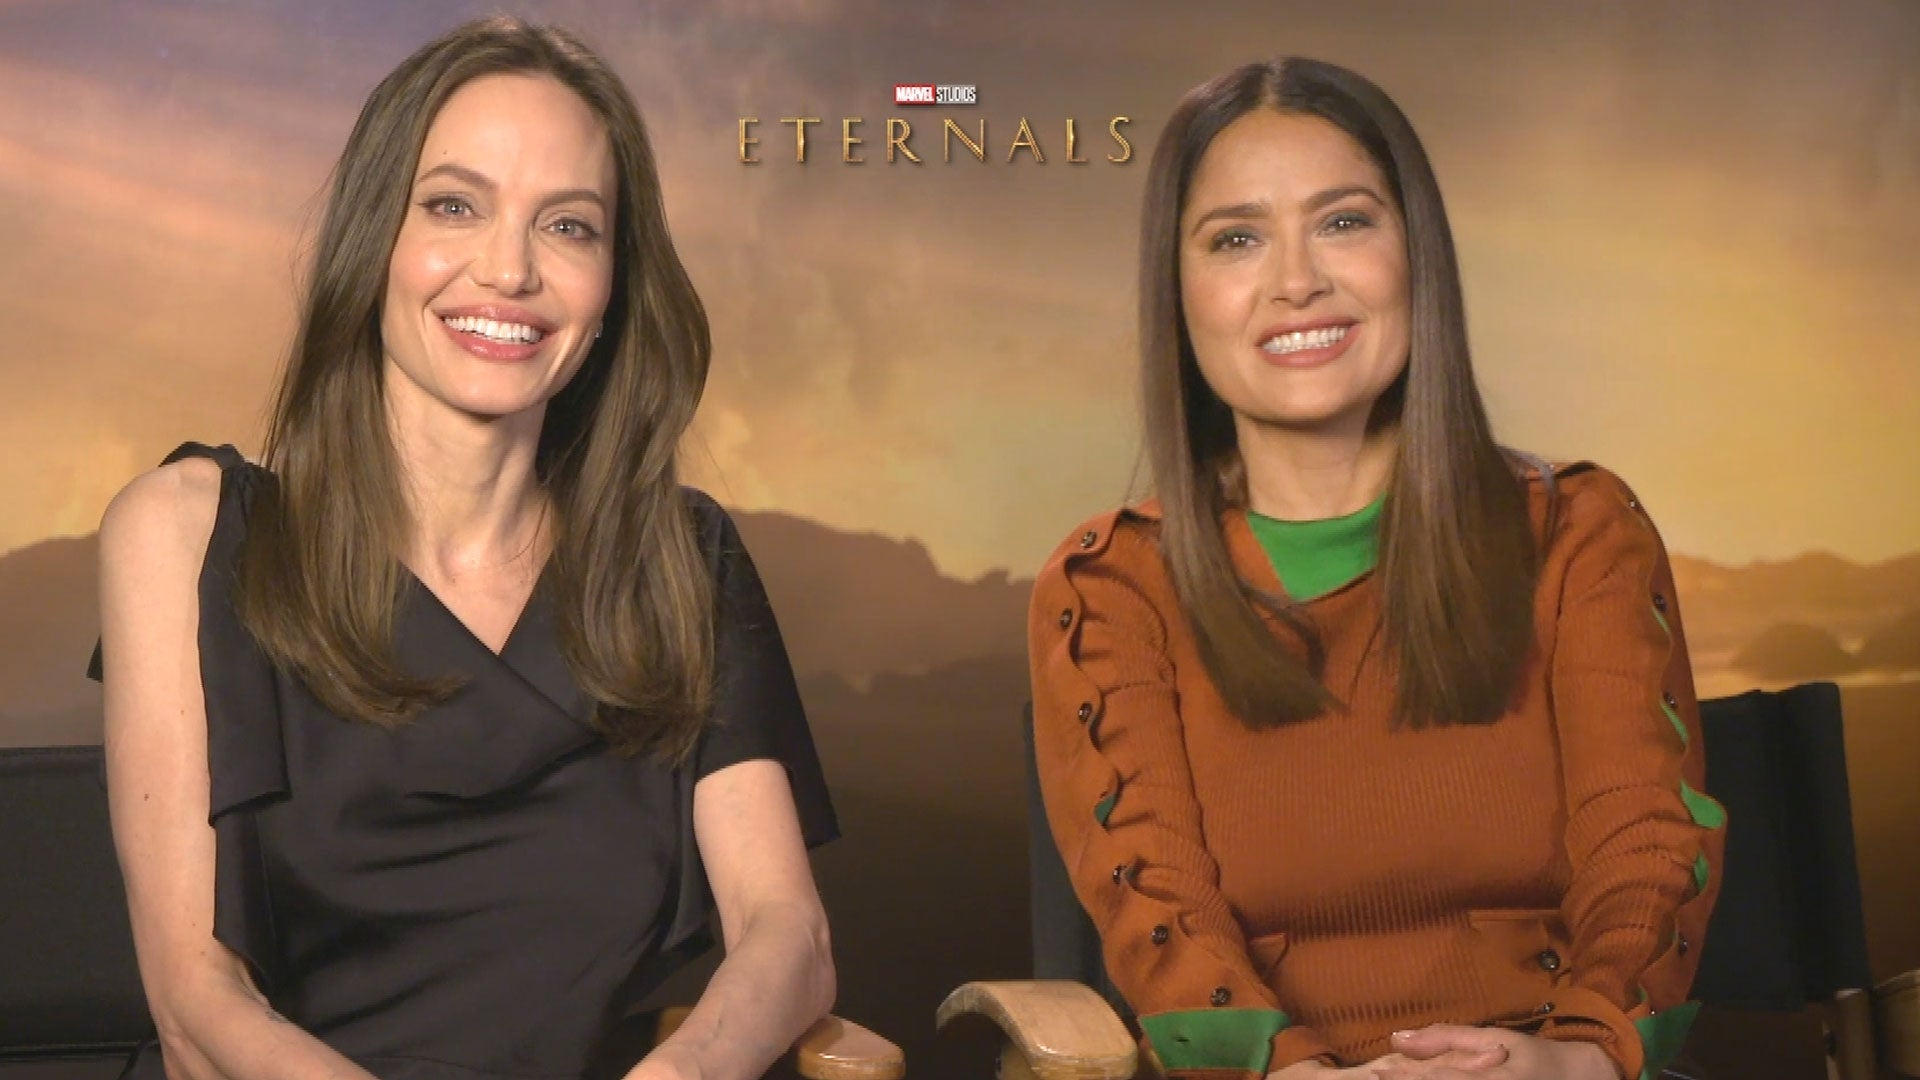 Angelina Jolie and Salma Hayek on Bonding Over Motherhood and Possible 'Eternals' Sequel (Exclusive)